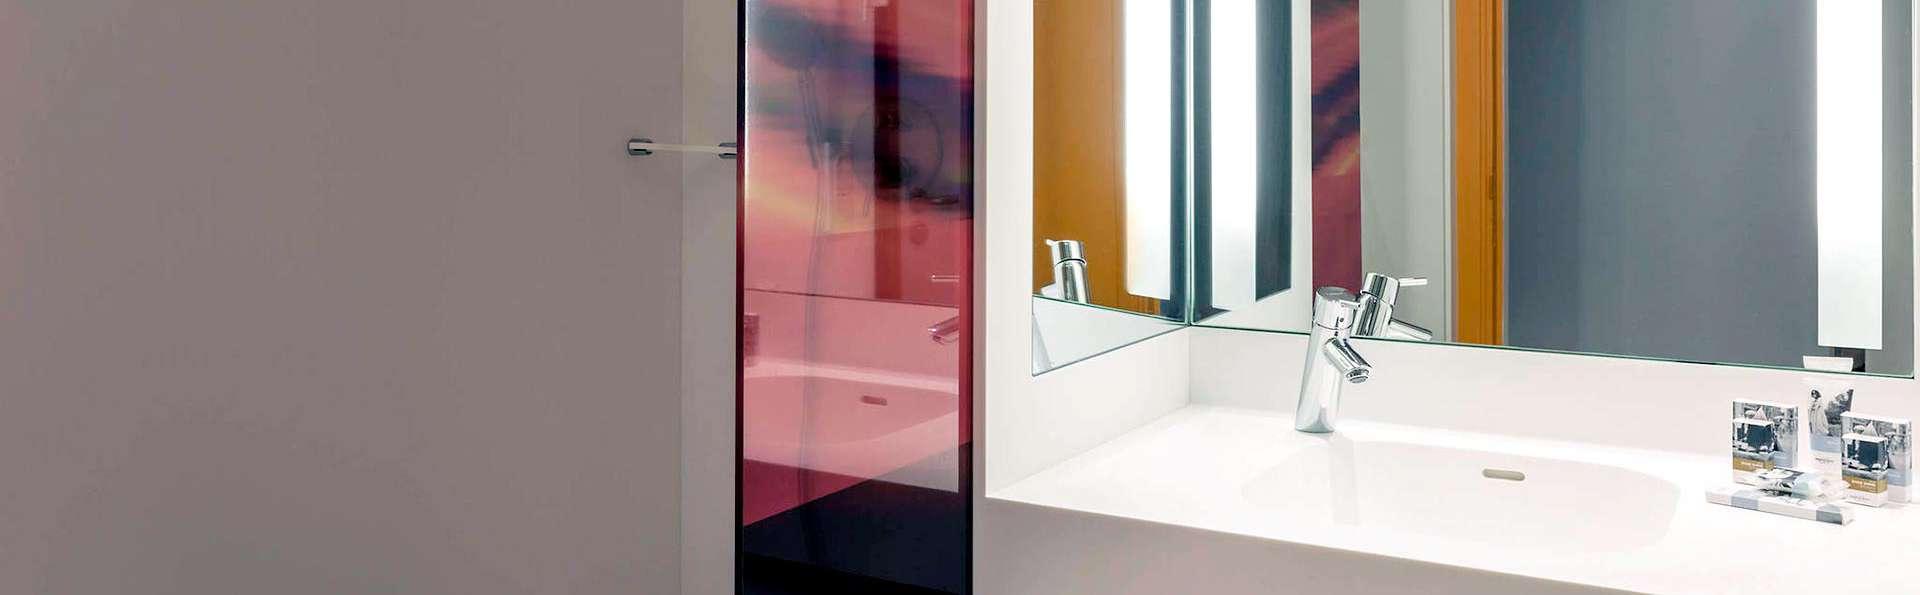 Mercure Paris Boulogne - Edit_Bathroom.jpg